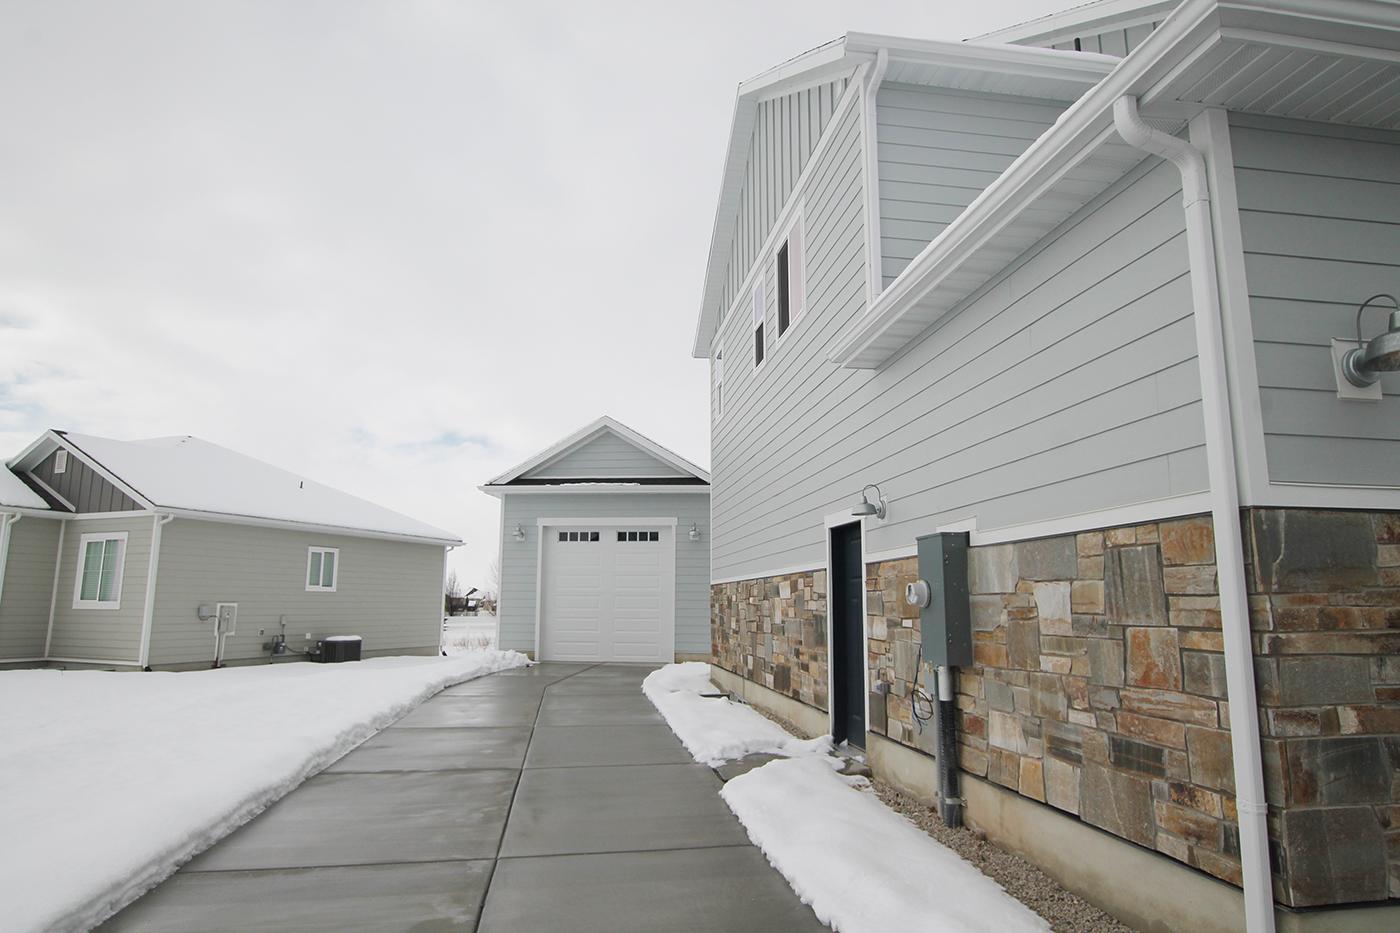 Qv1 detachedgarage 1400 concord homes concord homes for Detached garage utah